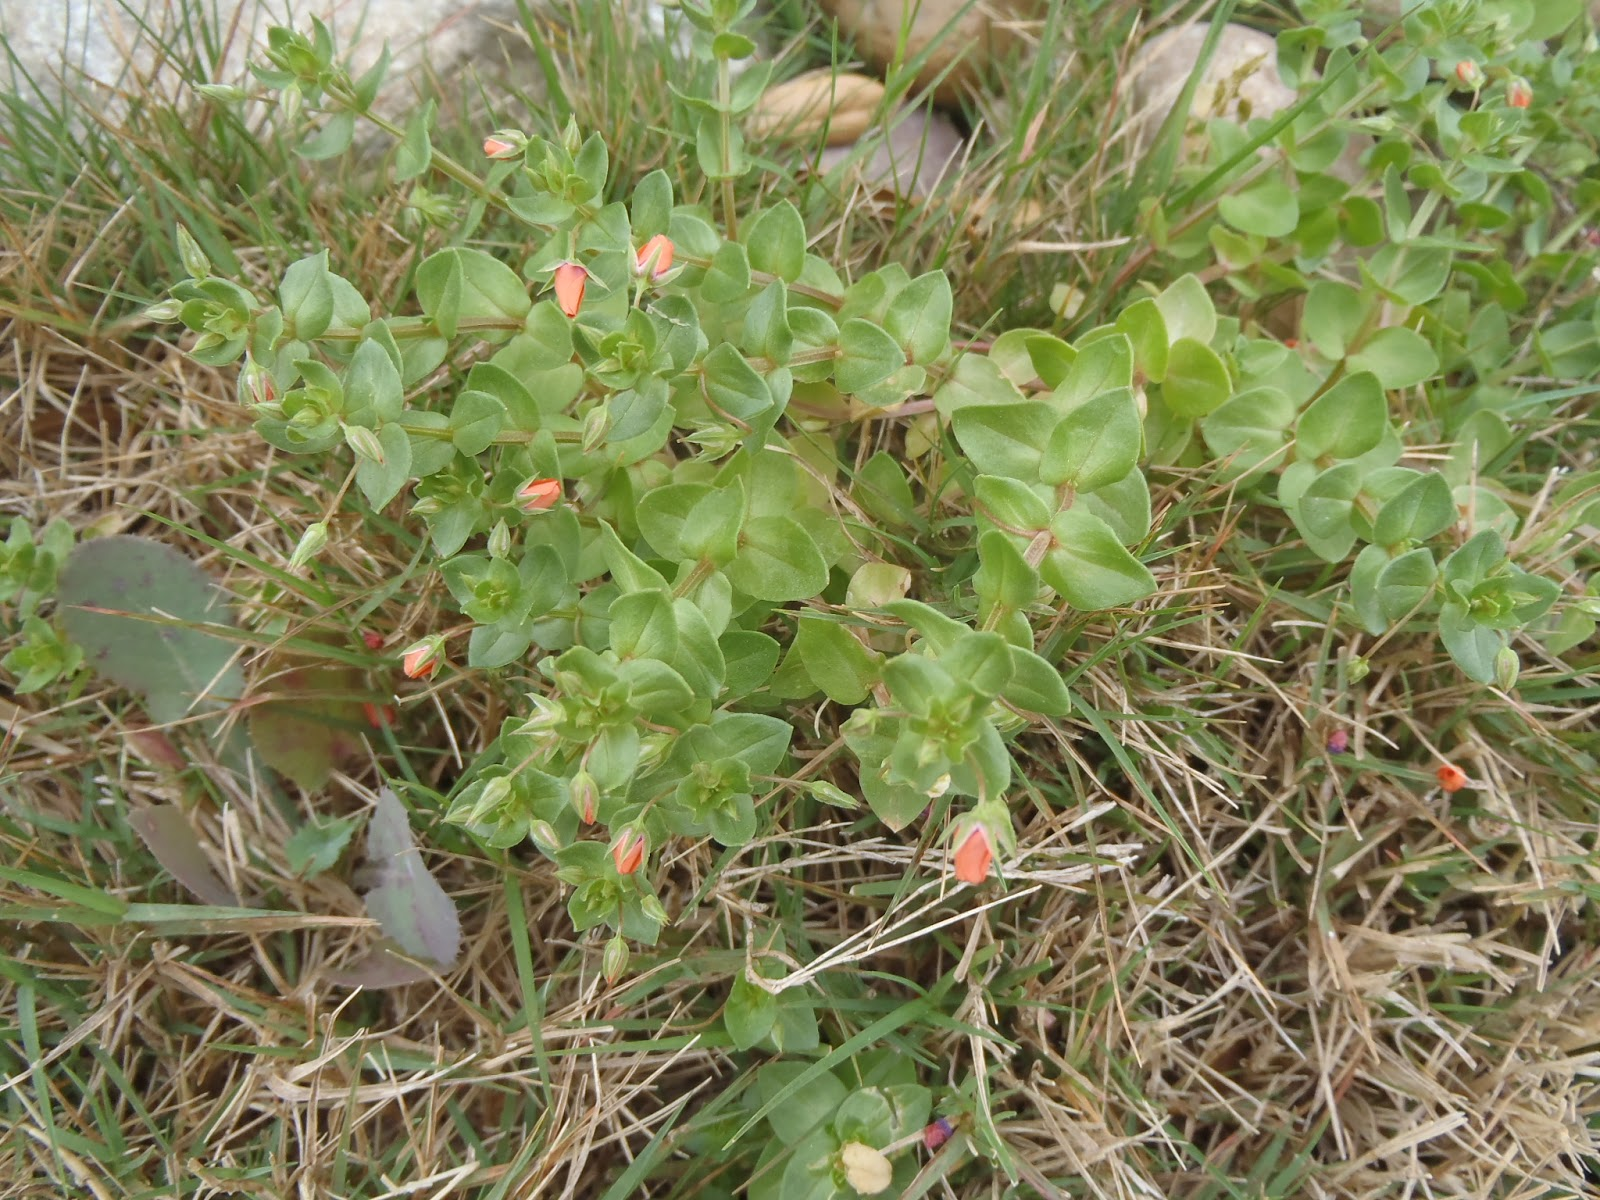 becky u0027s blog lots of fun shtuff san antonio edible weeds